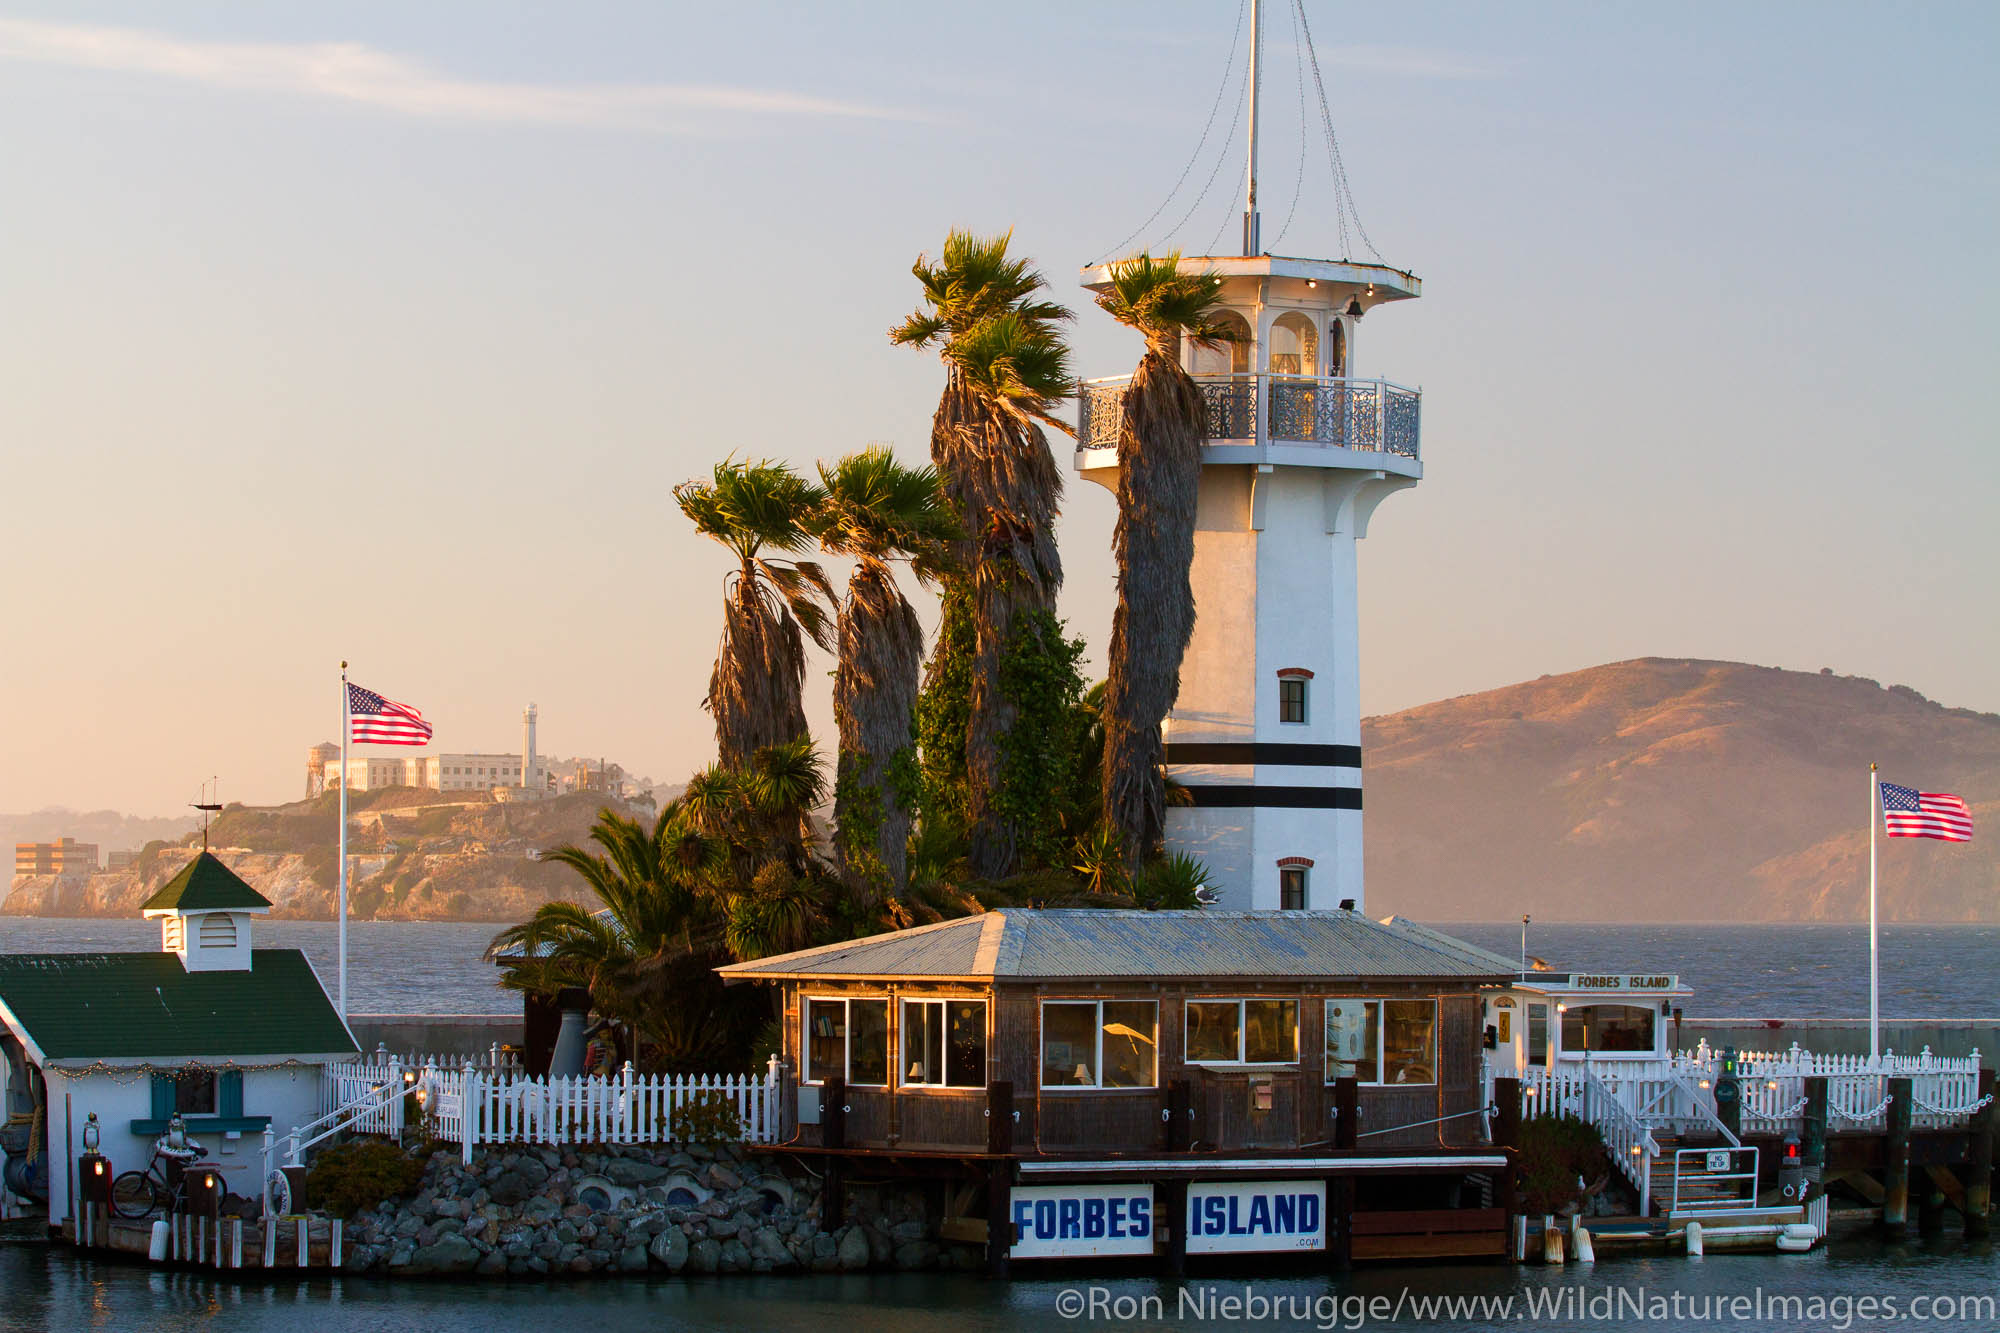 Forbes Island, Fisherman's Wharf, San Francisco, CA